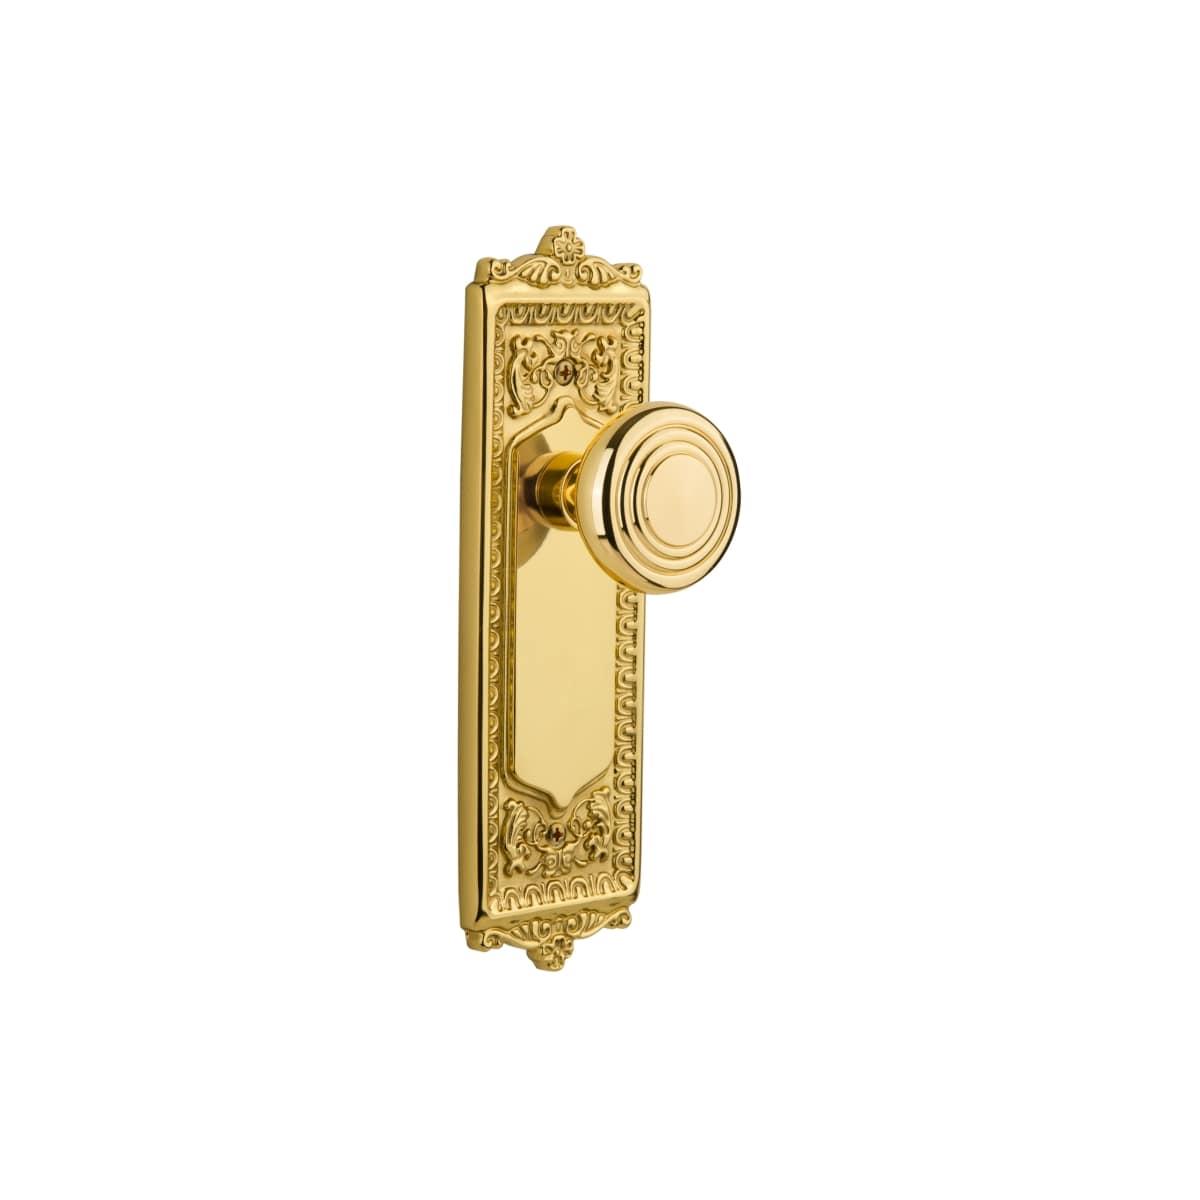 Details about  /ANTIQUE VINTAGE SET OF BRASS DOOR KNOBS #1